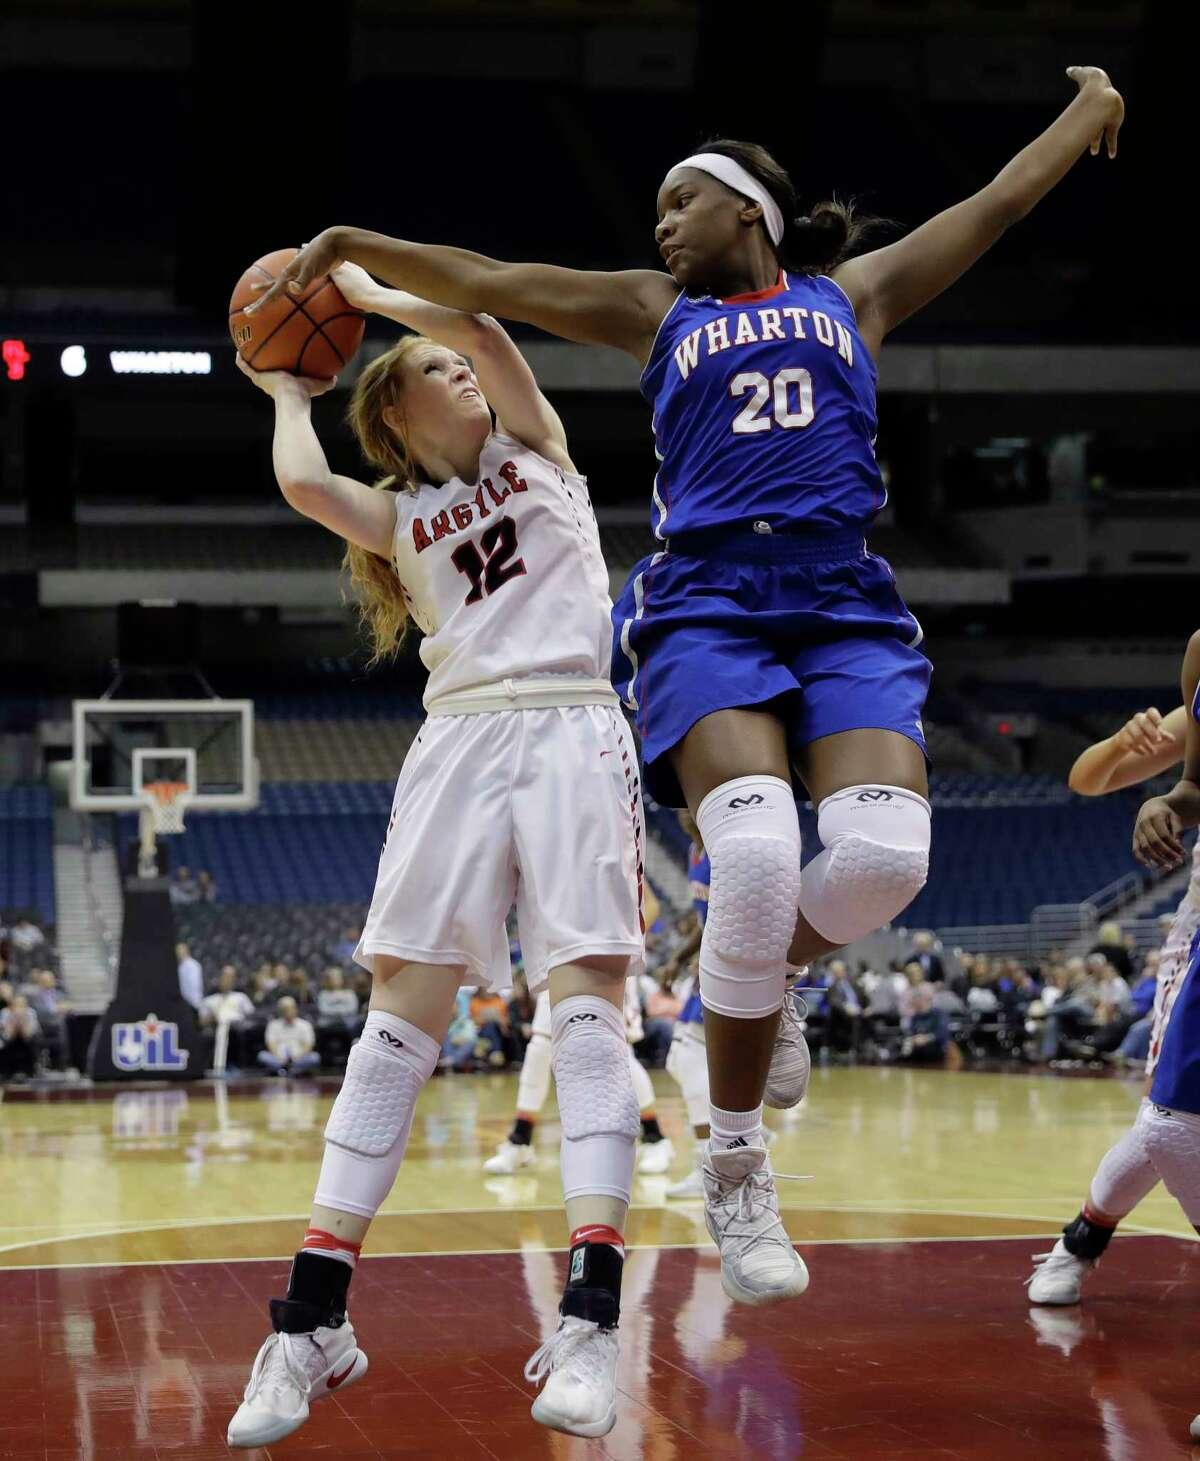 Argyle's Vivian Gray (12) looks to shoot past Wharton's Ciarra Mutshatshi (20) during a UIL Class 4A girls high school state semifinal basketball game, Friday, March 3, 2017, in San Antonio. Argyle won 71-31. (AP Photo/Eric Gay)